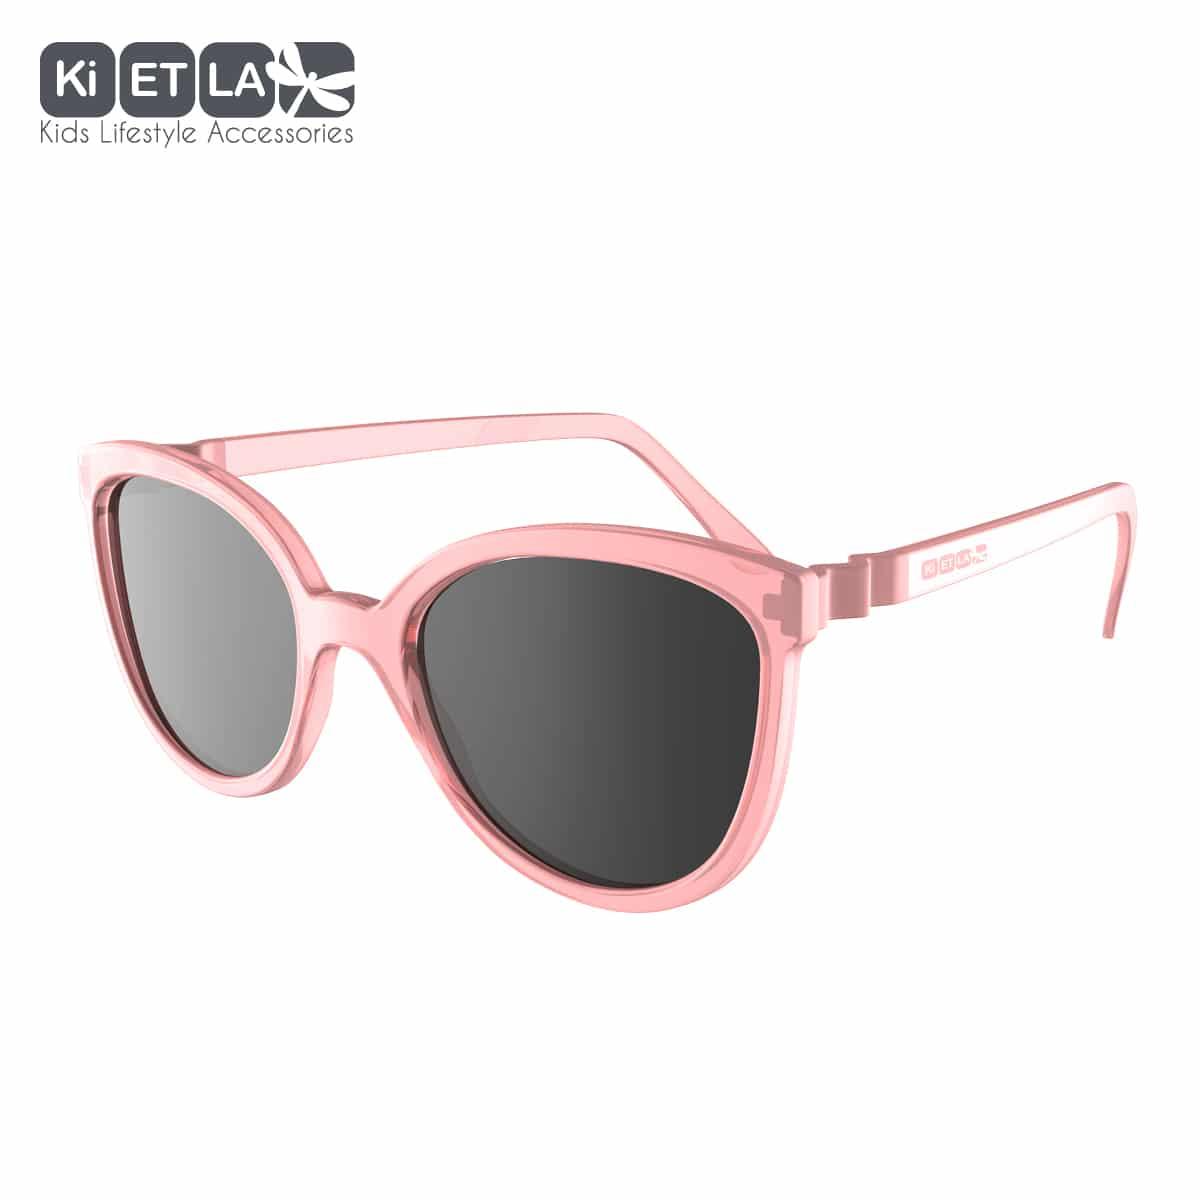 KiETLA CraZyg-Zag slnečné okuliare BuZZ 6-9 rokov